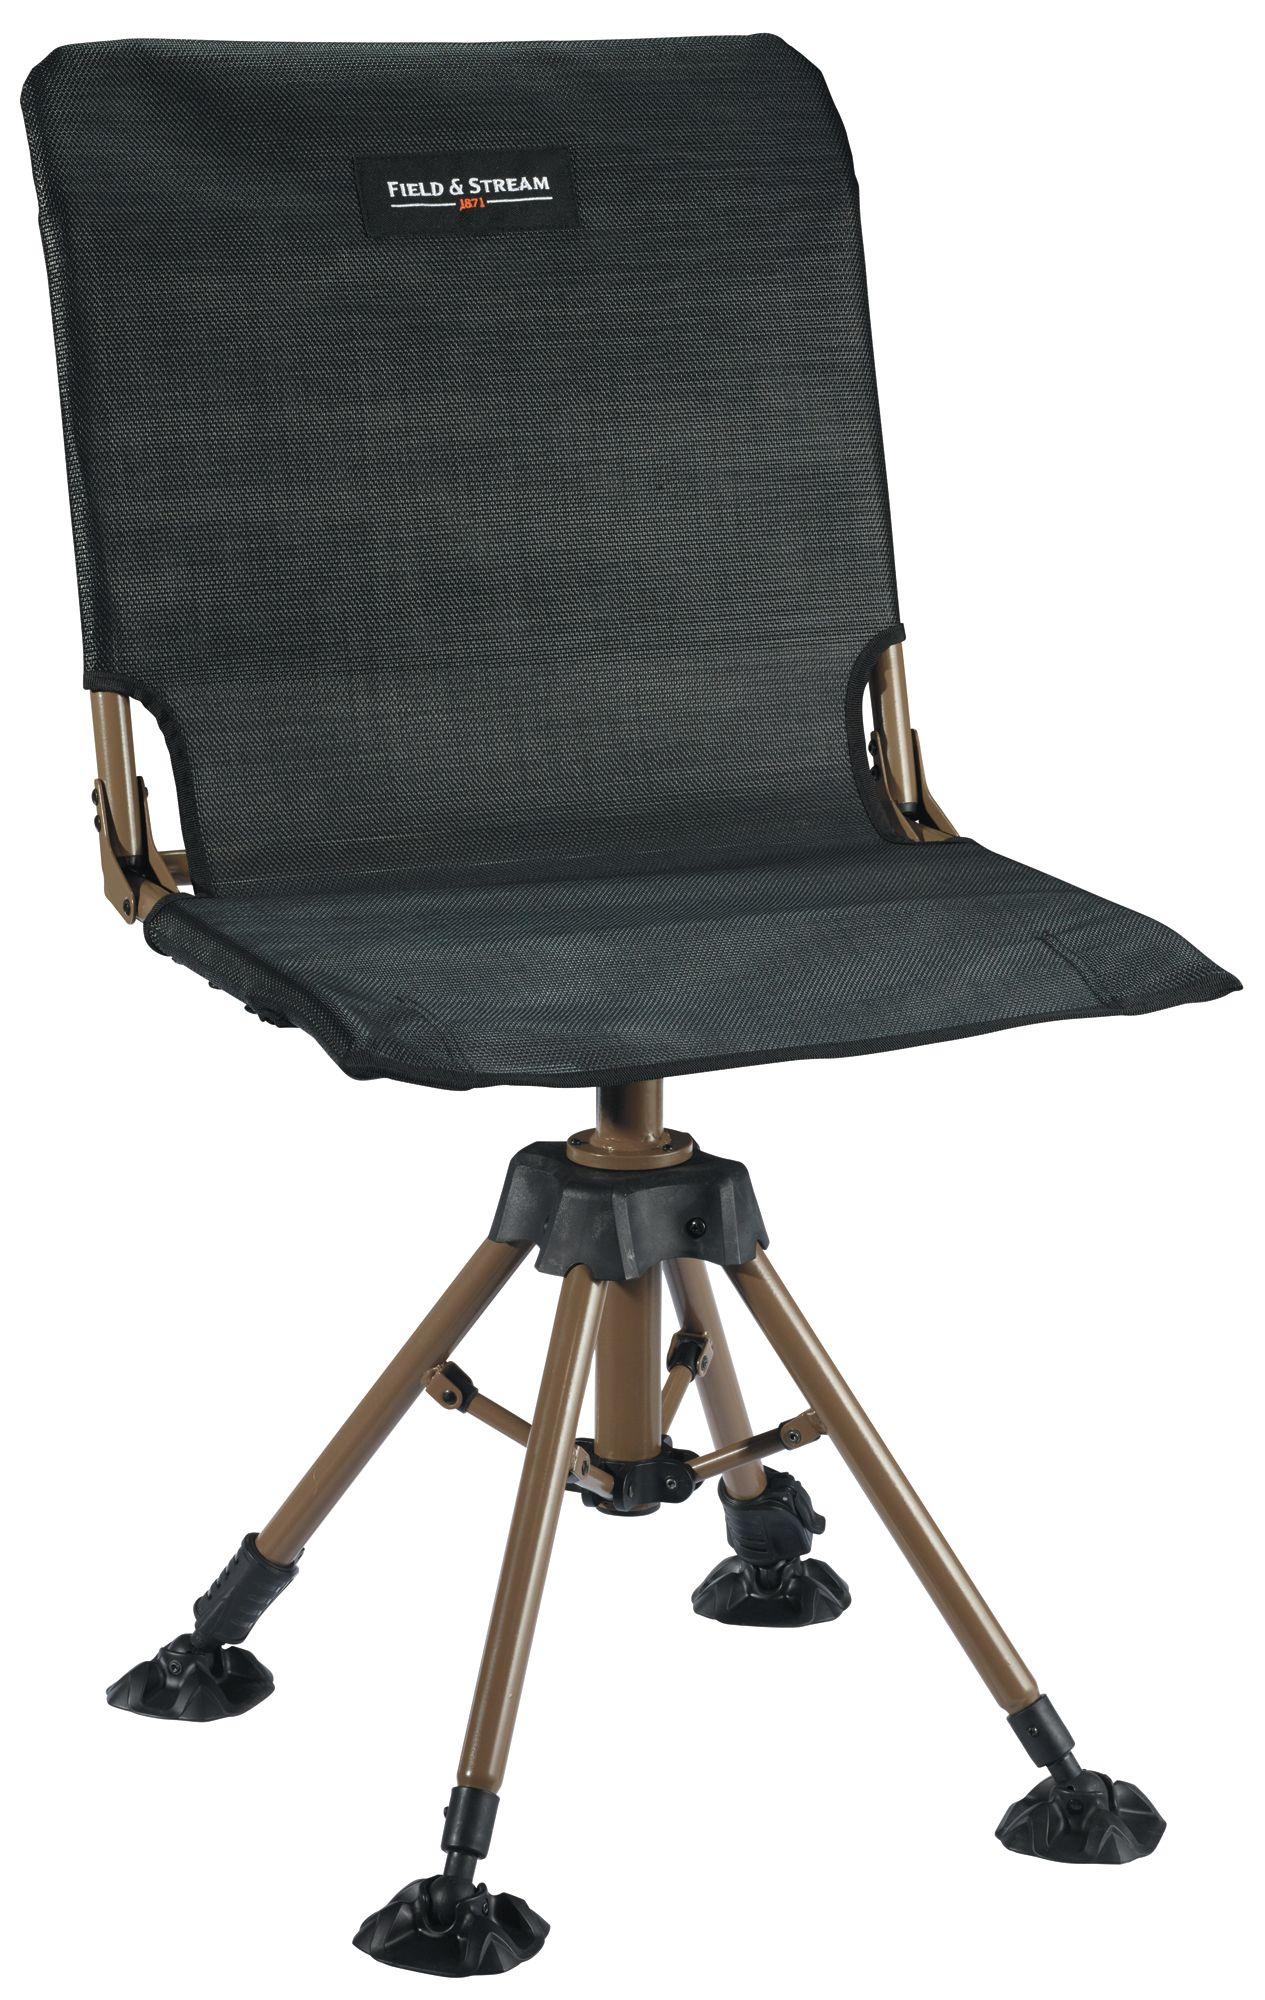 Field Amp Stream Rotating Blind Chair Field Amp Stream